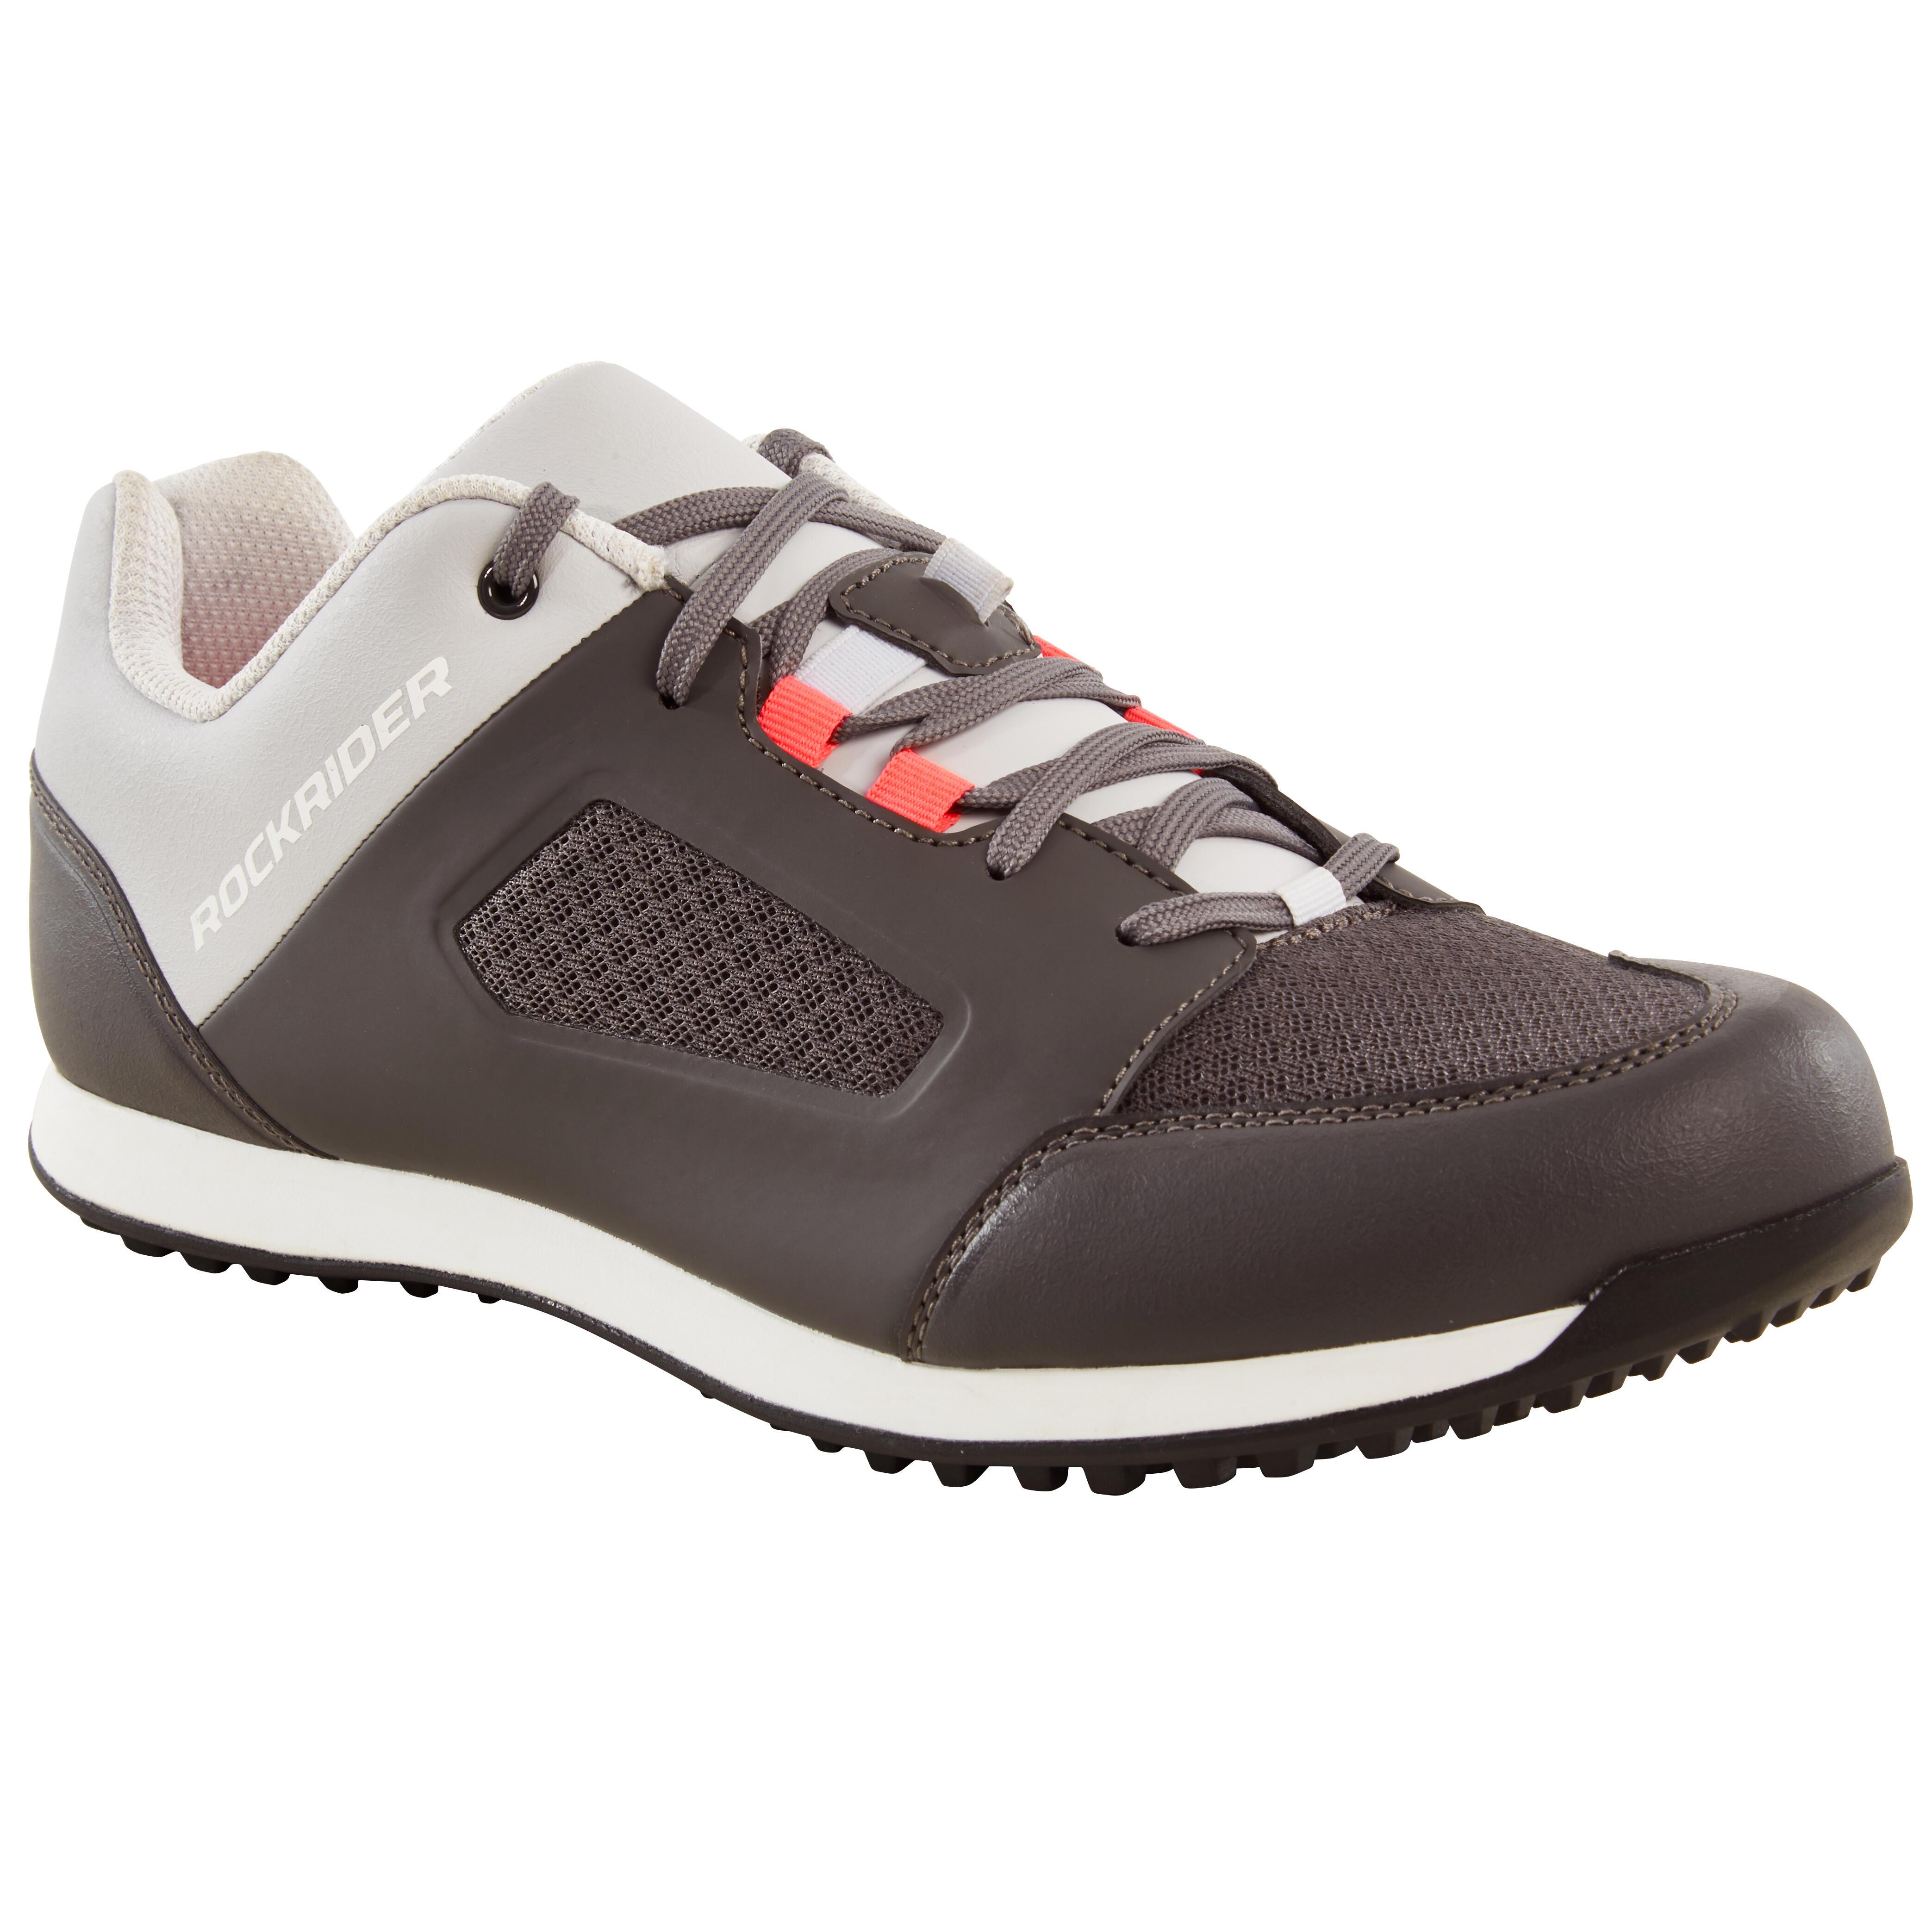 Fahrradschuhe MTB ST 100 grau | Schuhe > Sportschuhe > Fahrradschuhe | Grau - Weiß | St | Rockrider